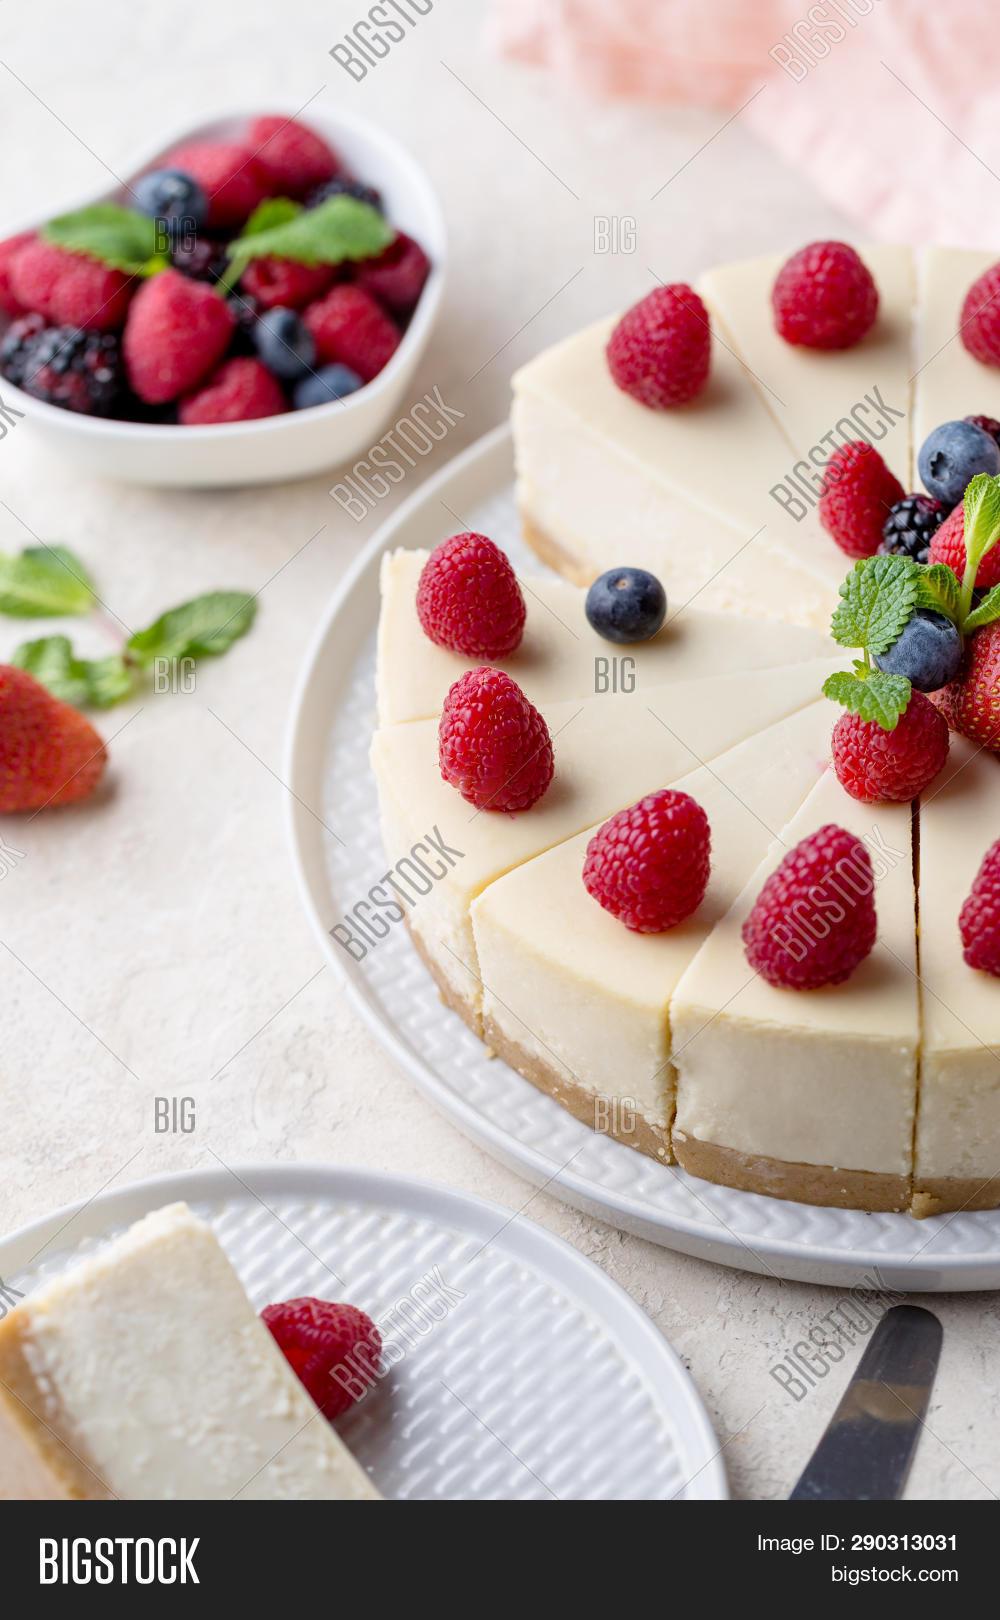 Pleasant Piece Birthday Cake Image Photo Free Trial Bigstock Personalised Birthday Cards Petedlily Jamesorg